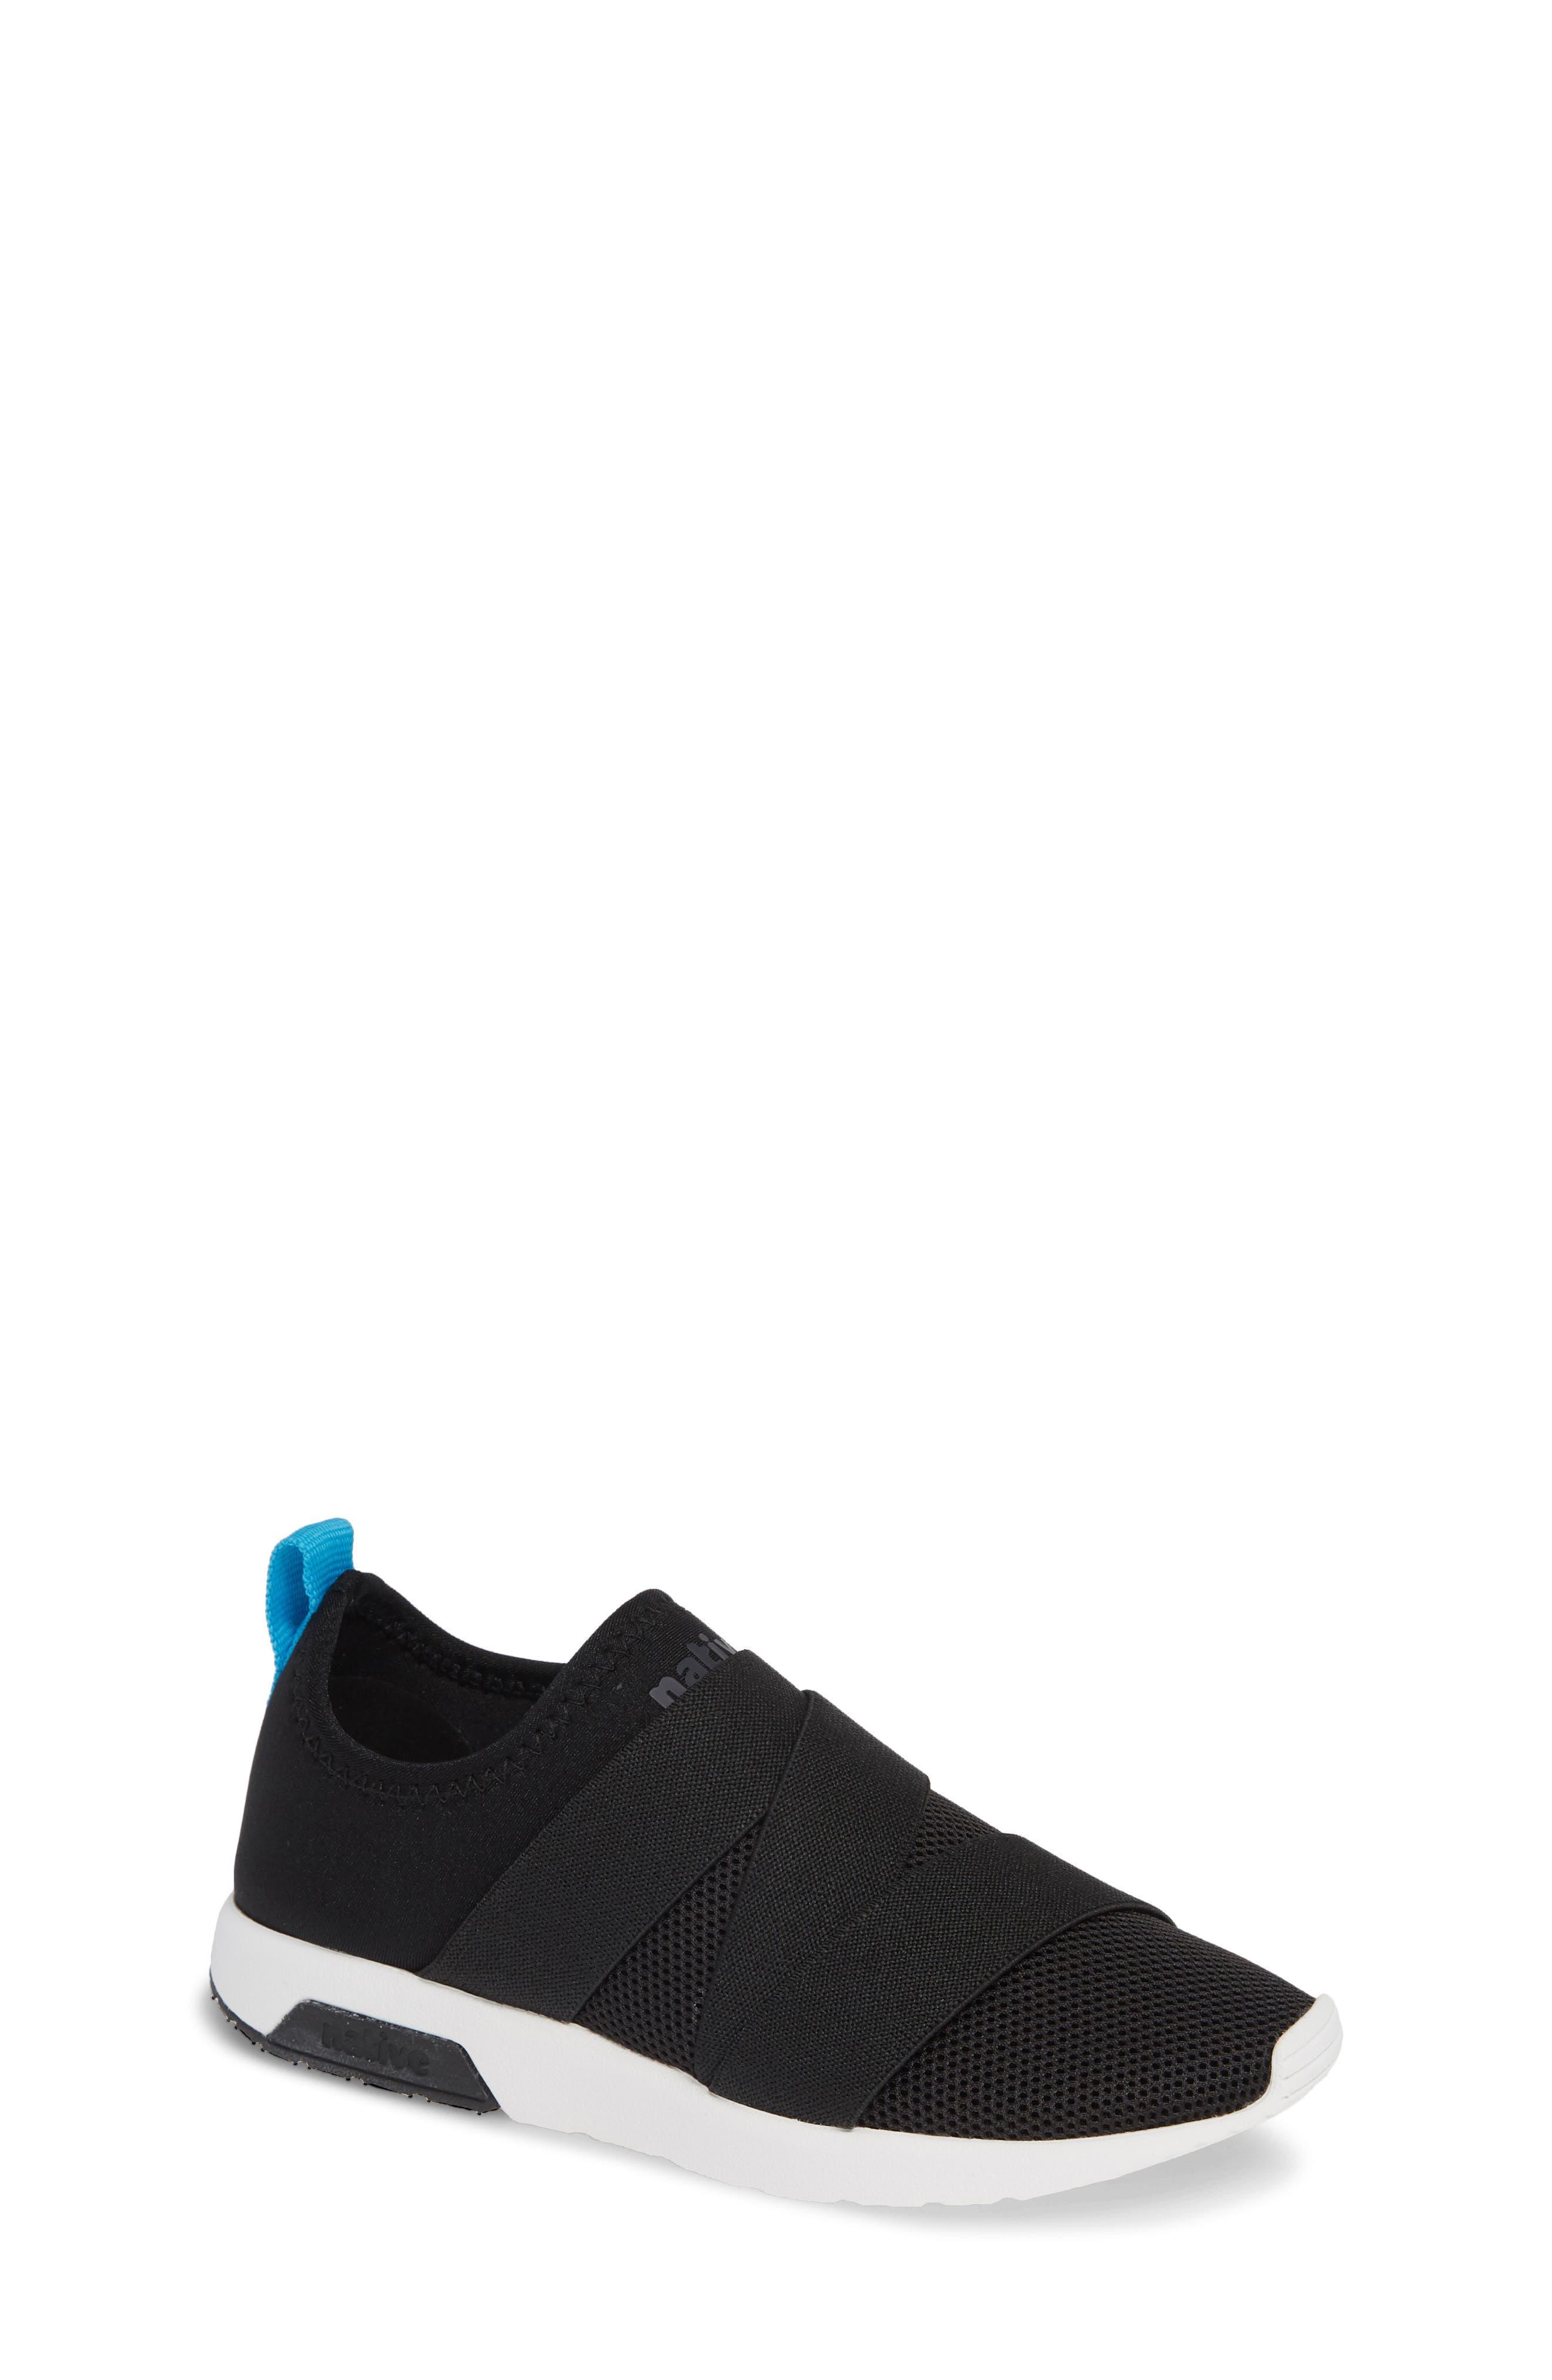 Native Shoes Phoenix Slip-On Vegan Sneaker